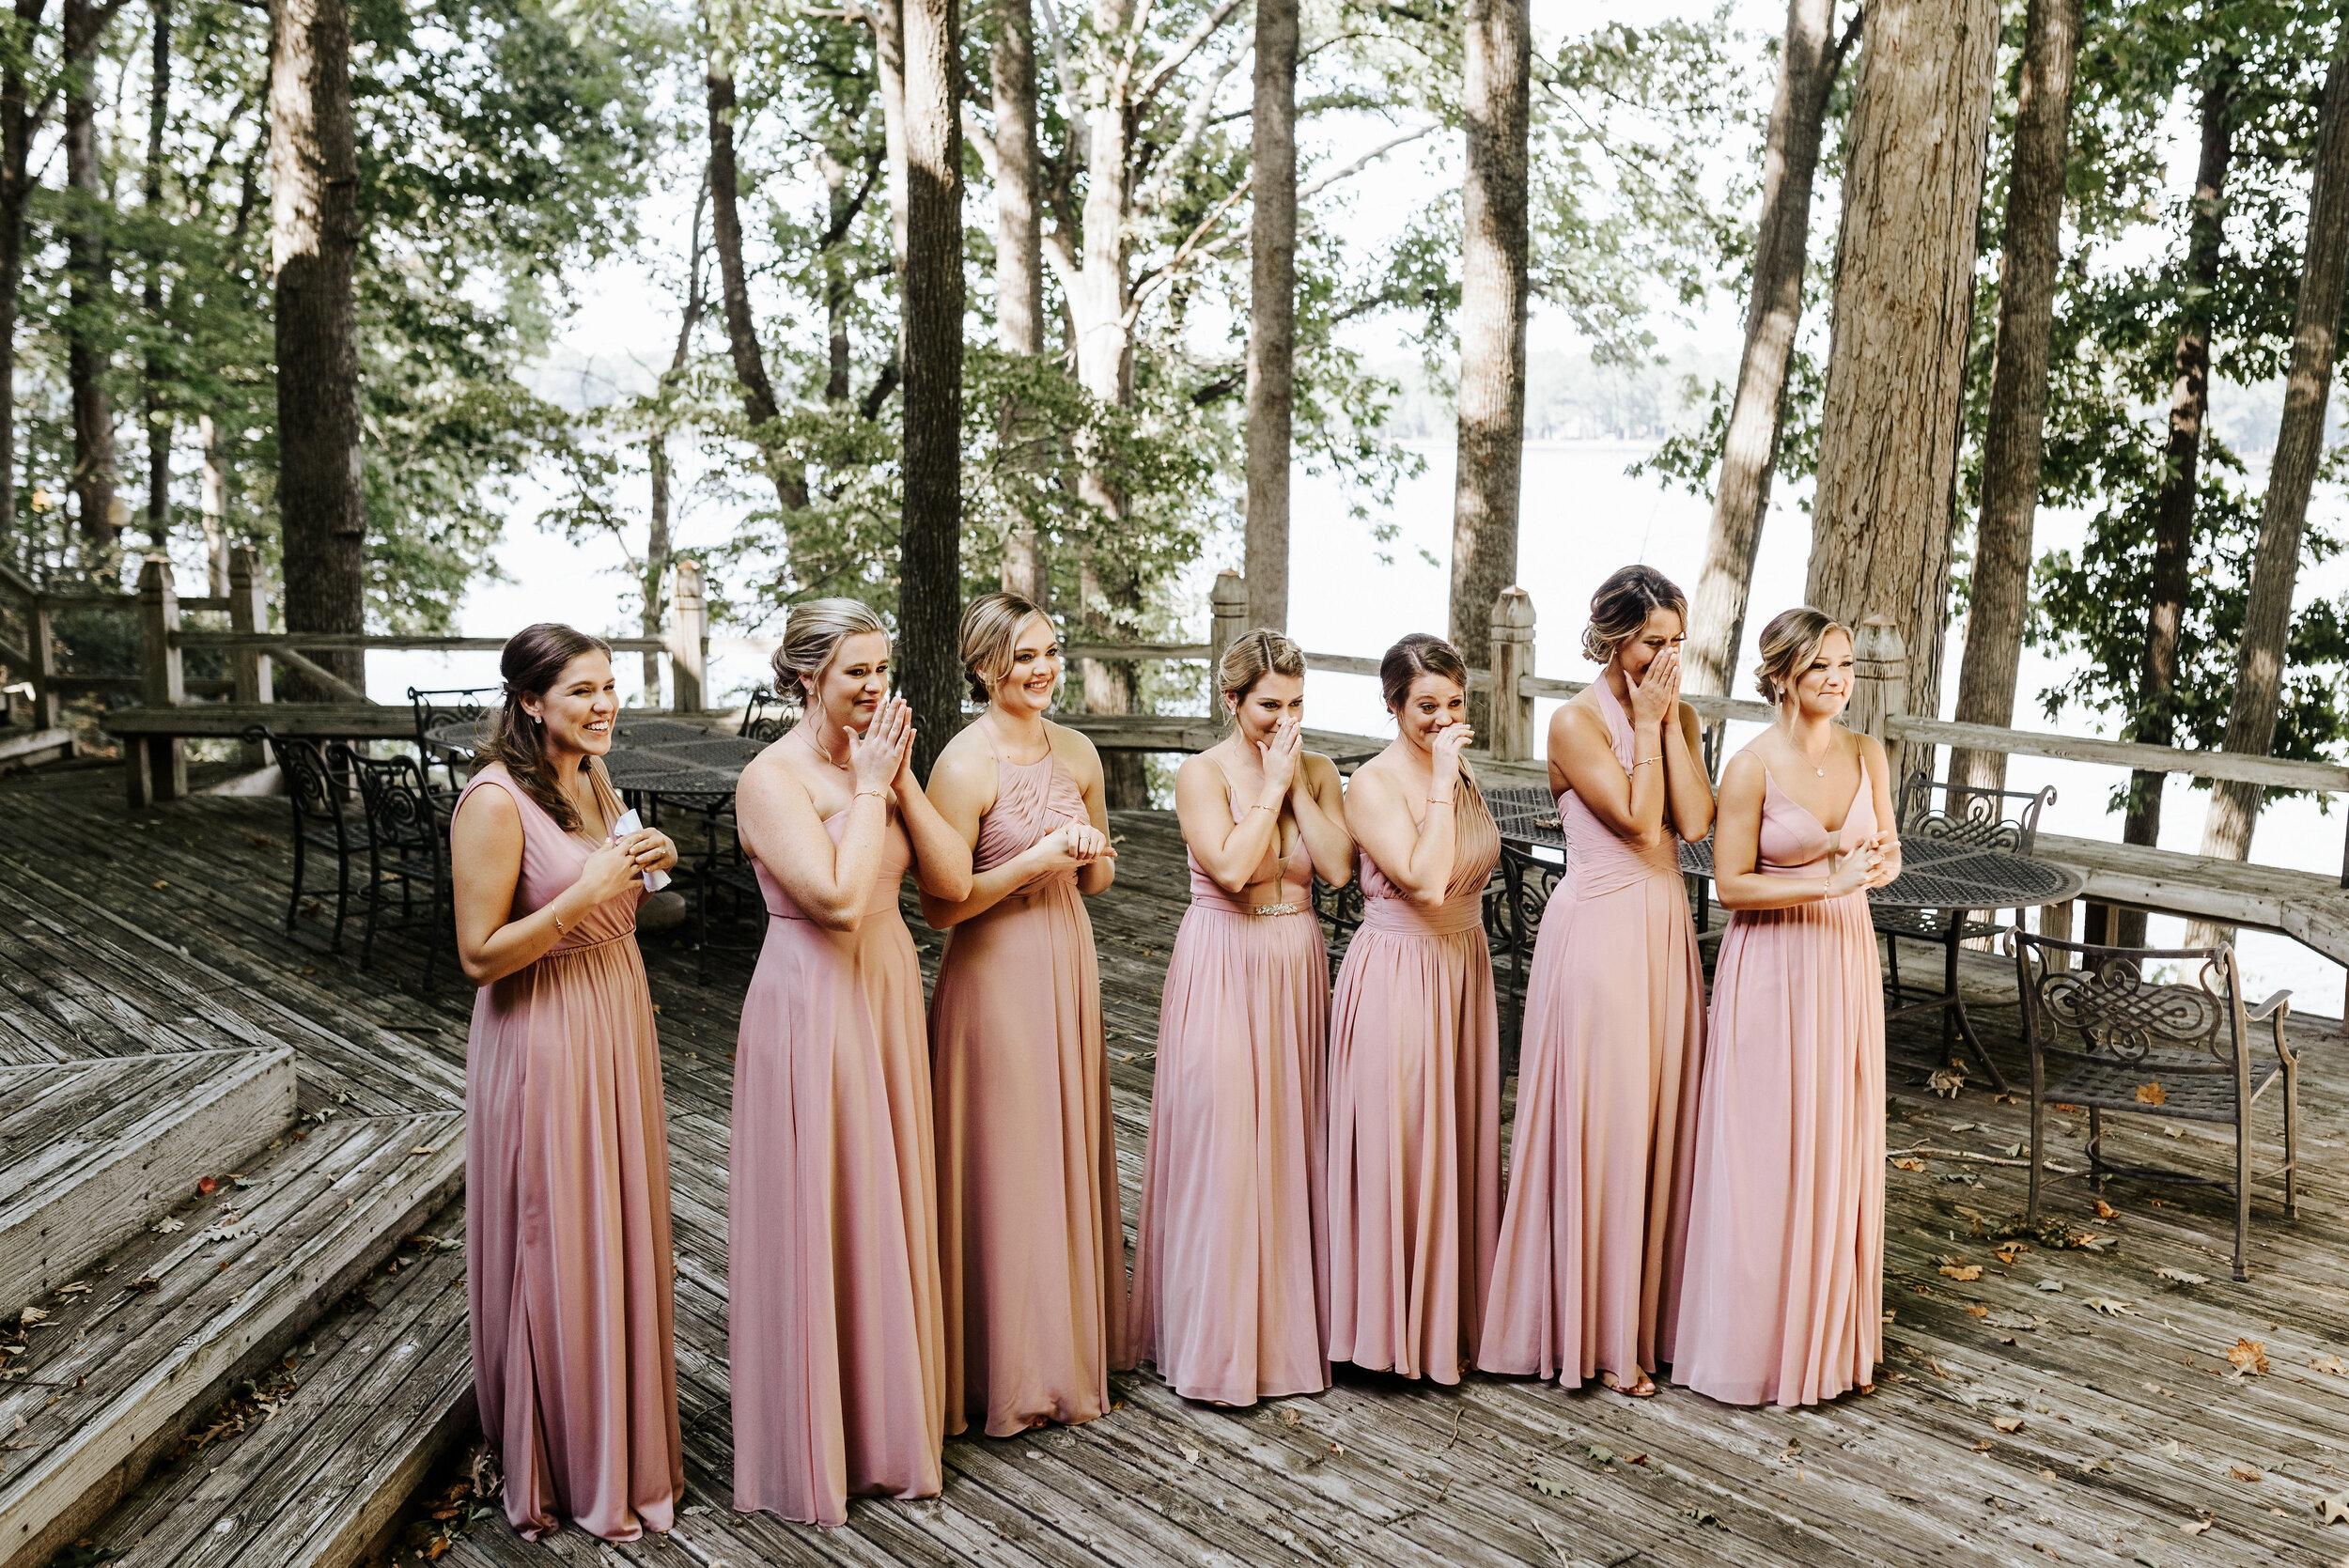 Emily_Mike_Wedding_Celebrations_at_the_Reservoir_Pool_Pavilion_Richmond_Virginia_Wedding_Photographer_Photography_by_V_17.jpg